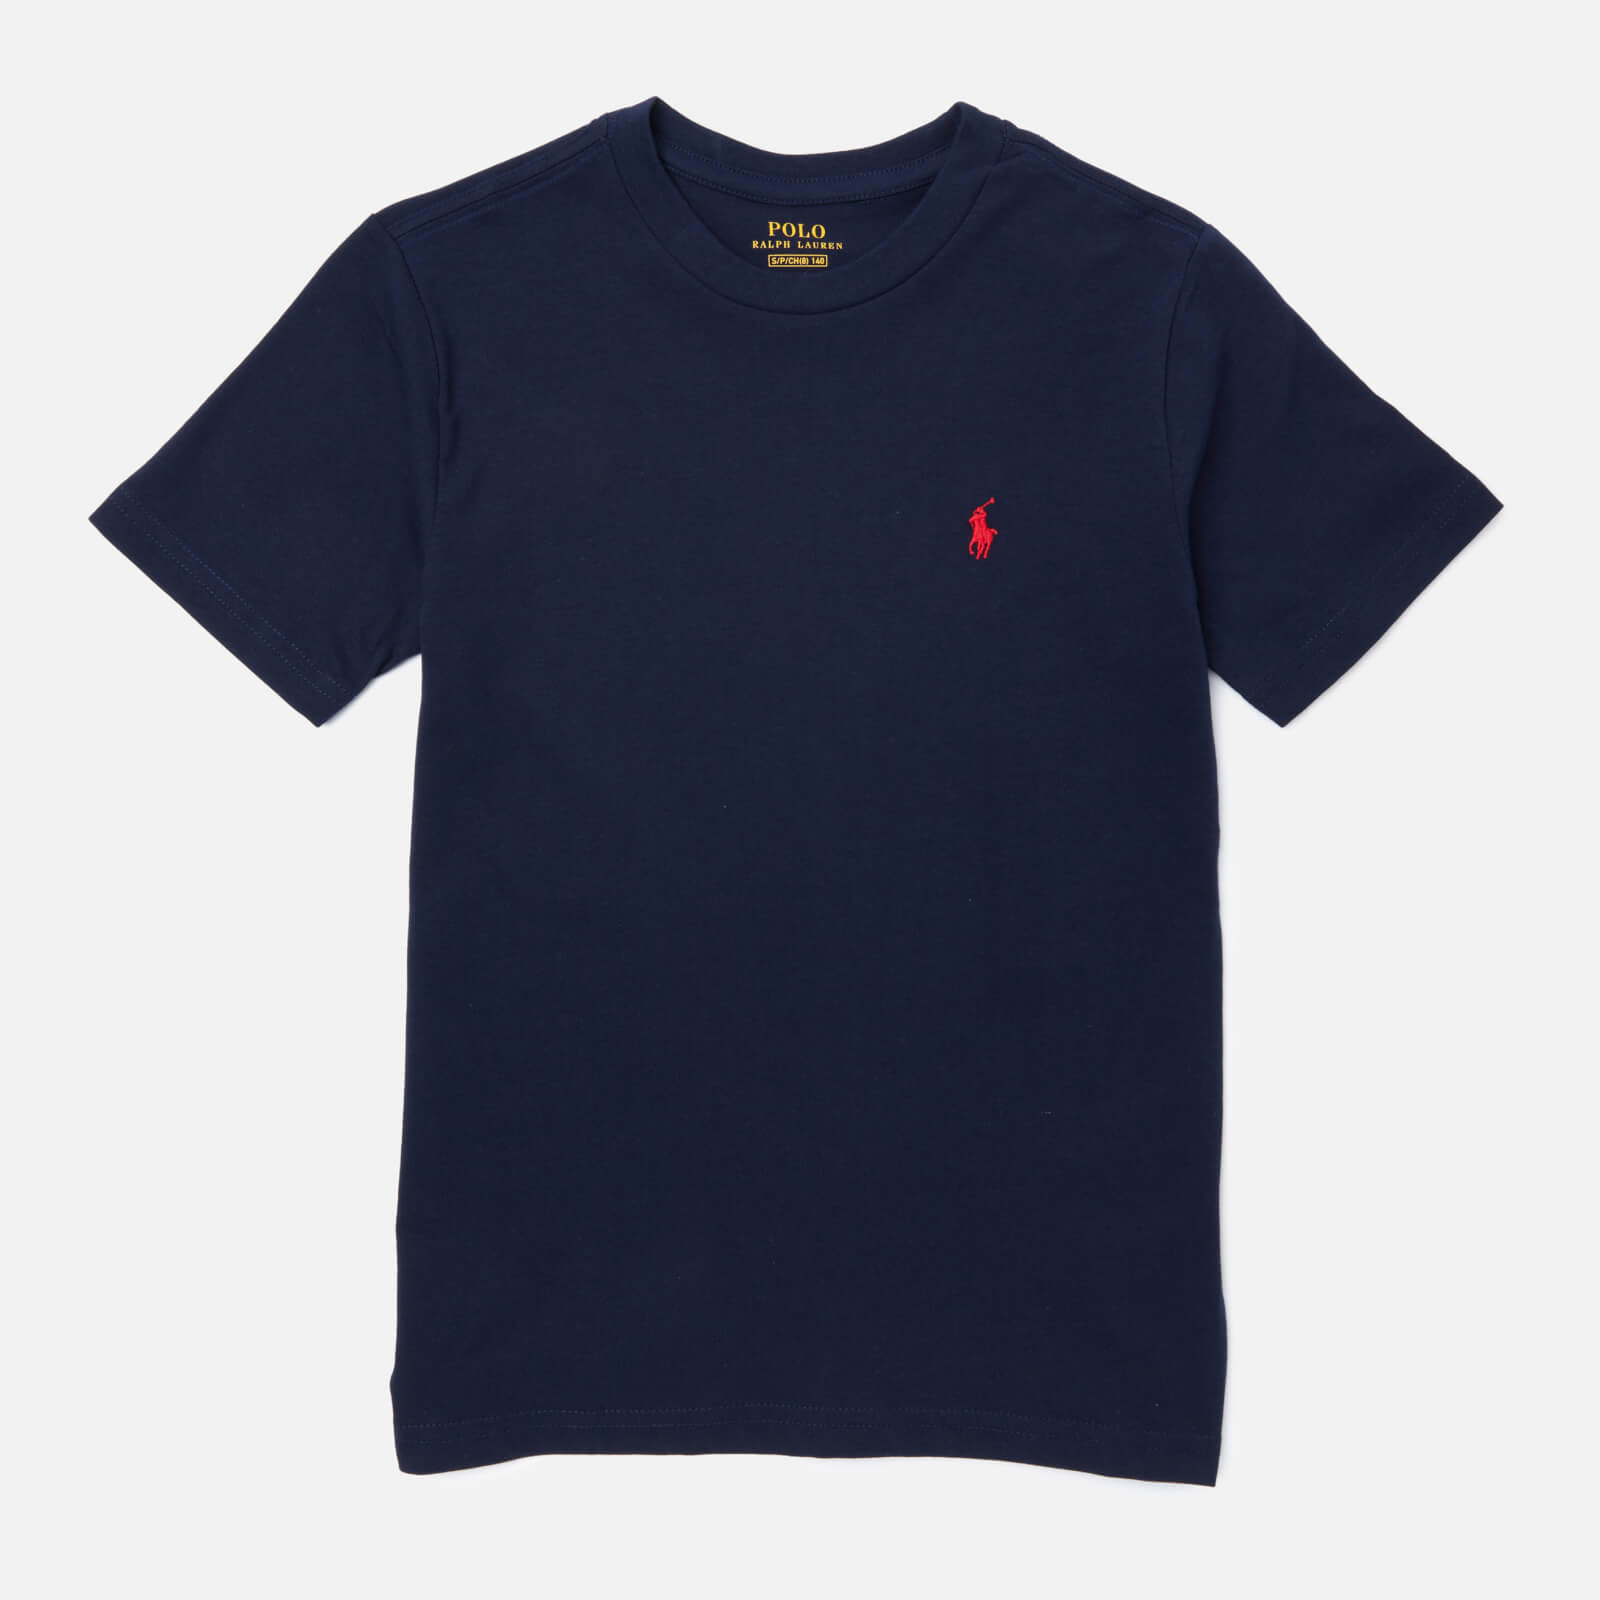 Polo Ralph Lauren Boys' Crew Neck T-Shirt - Navy - 8 Years